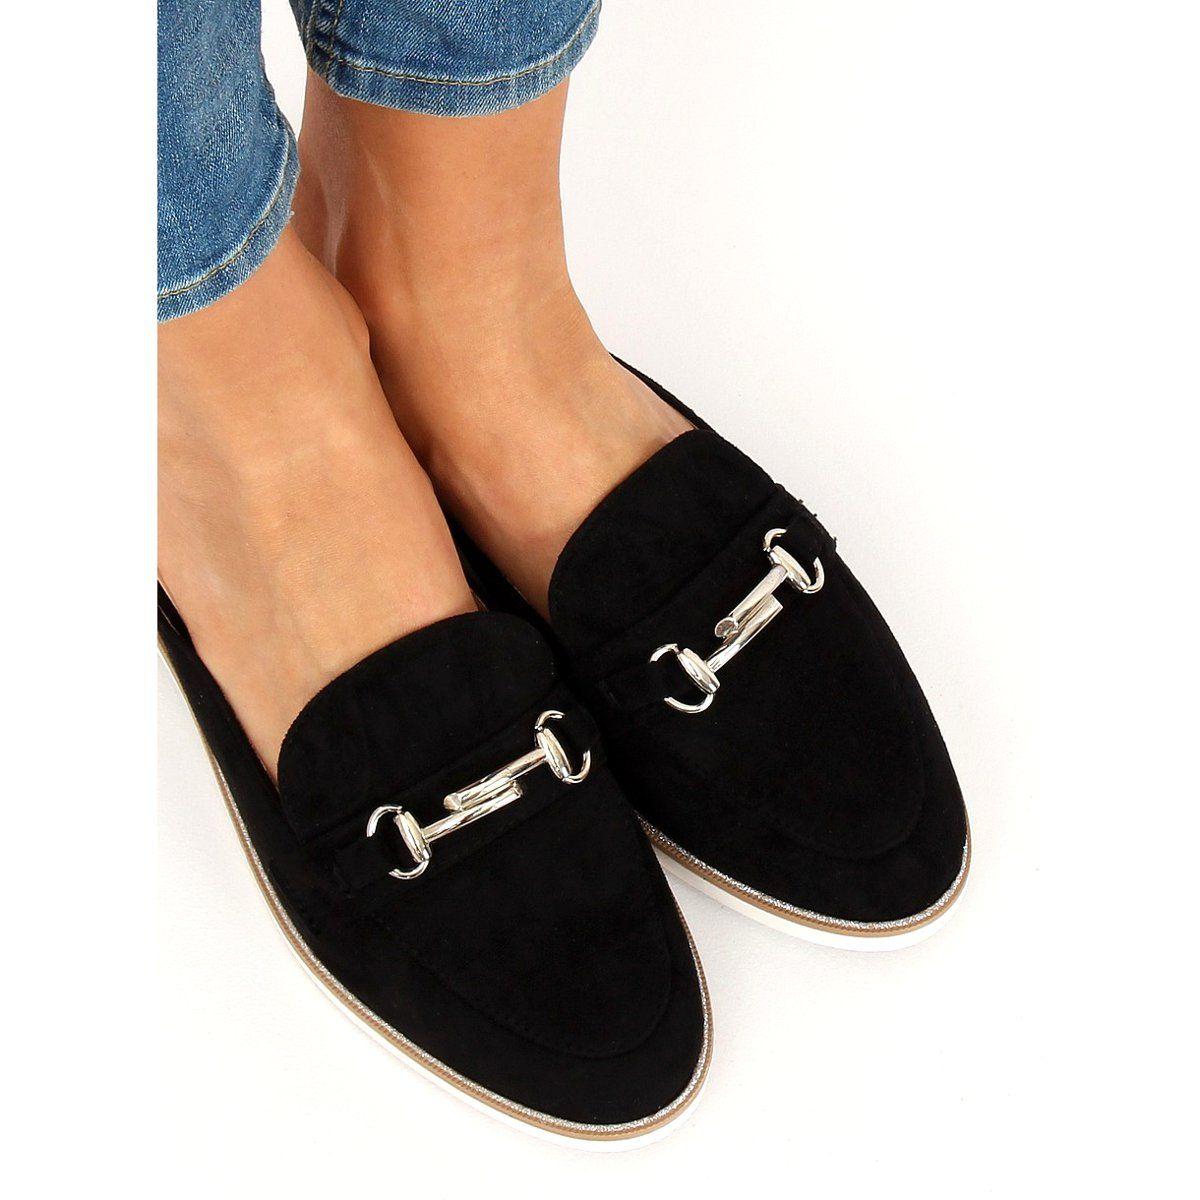 Klapki Mokasyny Czarne F9375 Black Black Loafers Womens Slippers Loafers